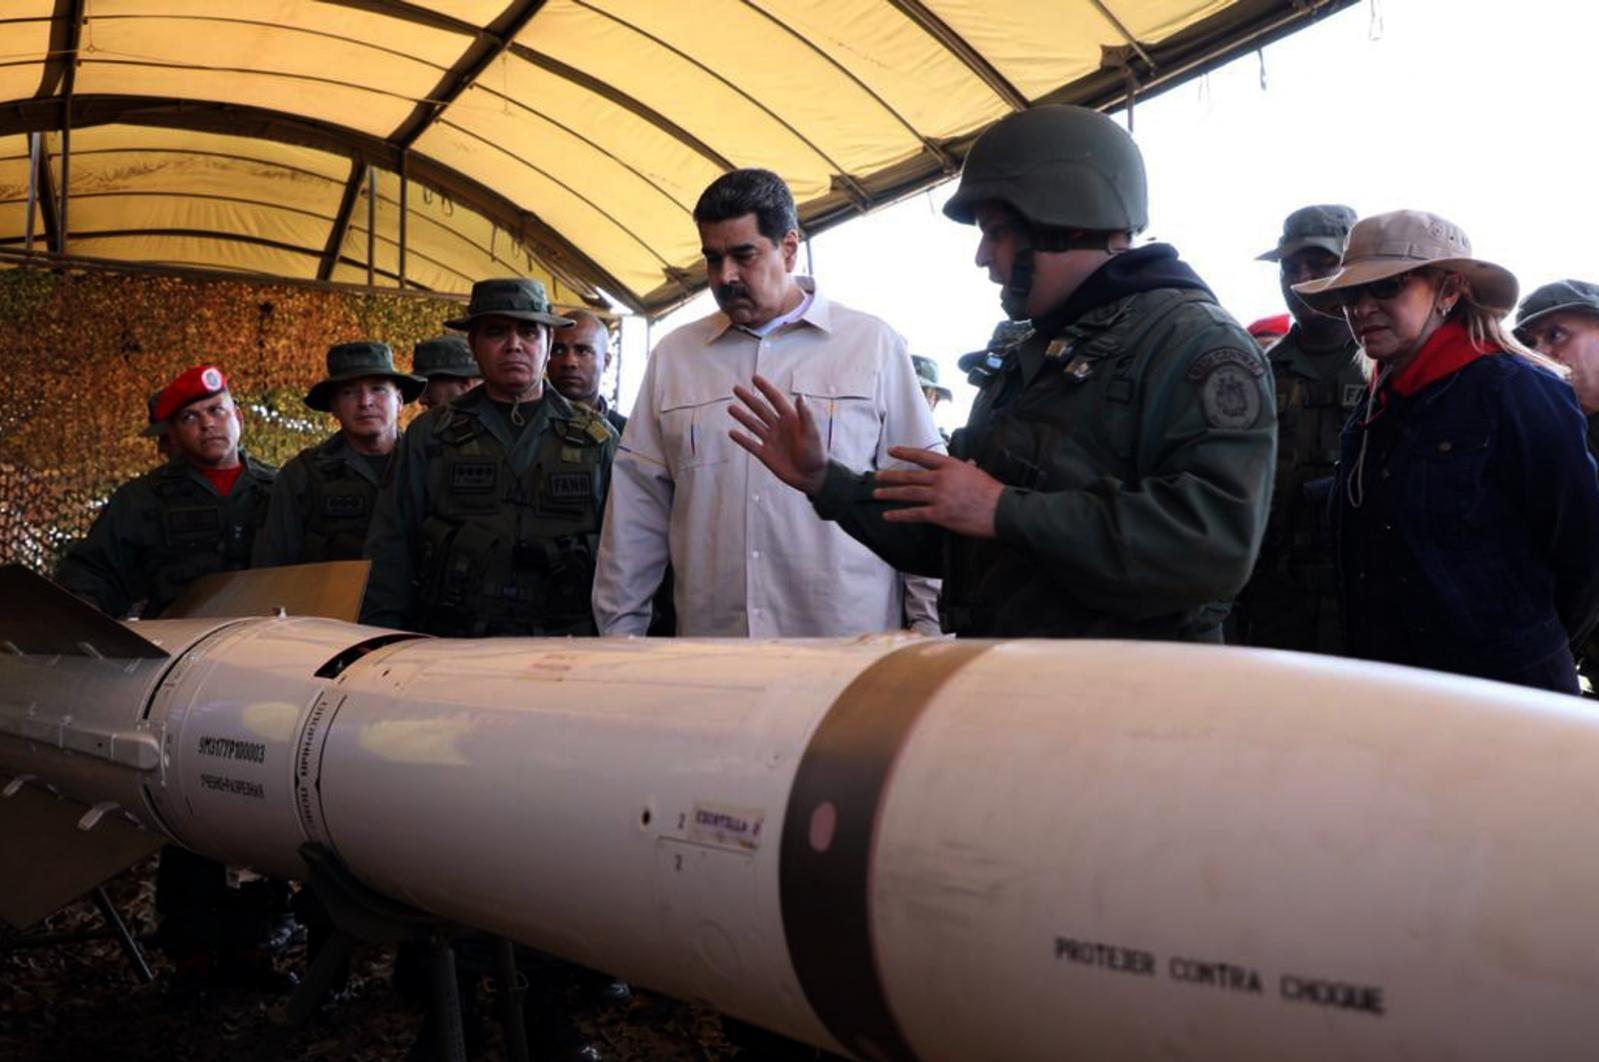 Maduro med vojaki Vir:Pixsell